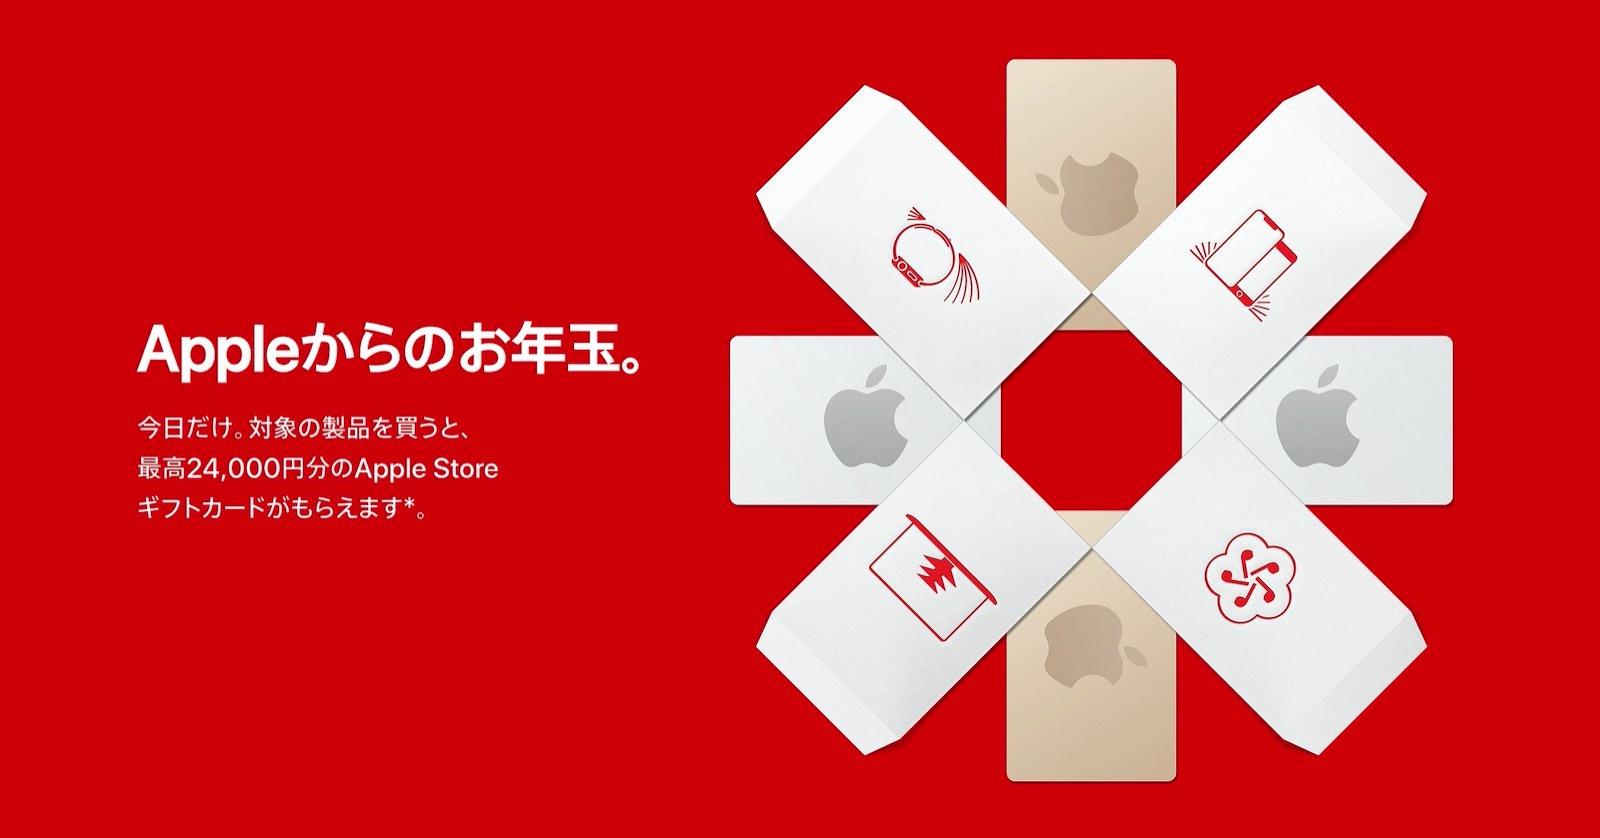 Apple-New-Year-Gift-2020.jpg